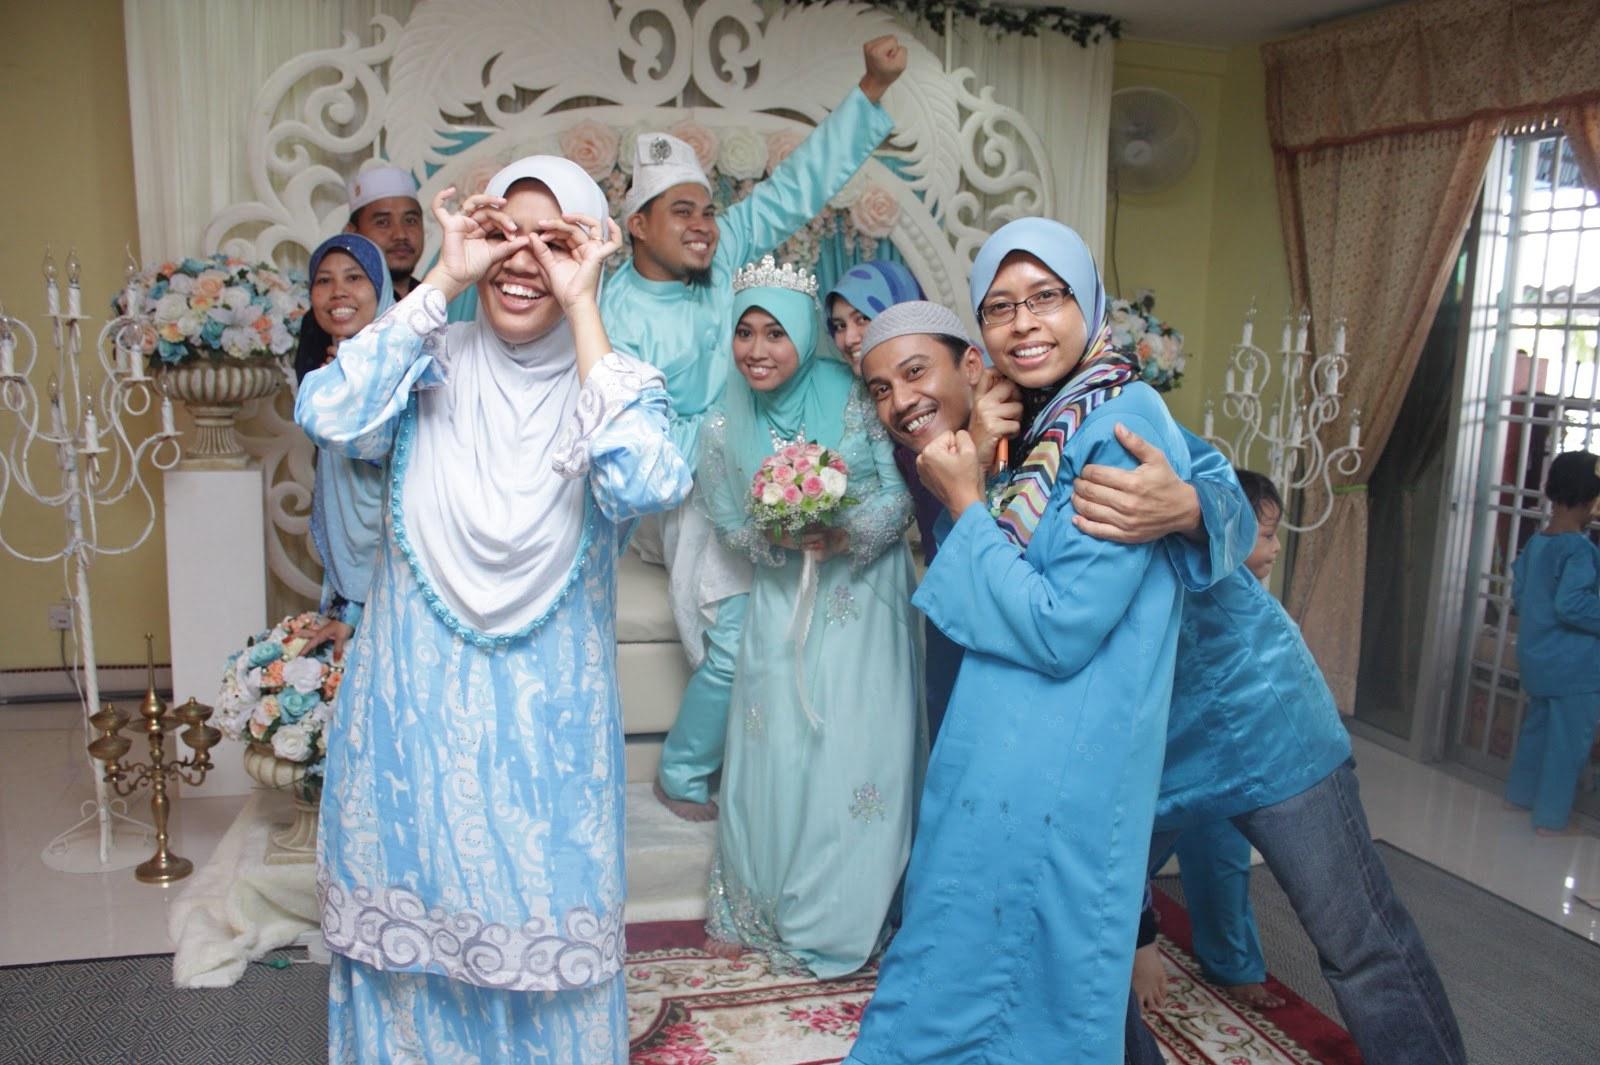 Design Jual Baju Pengantin Muslimah Murah D0dg Life with A View December 2012